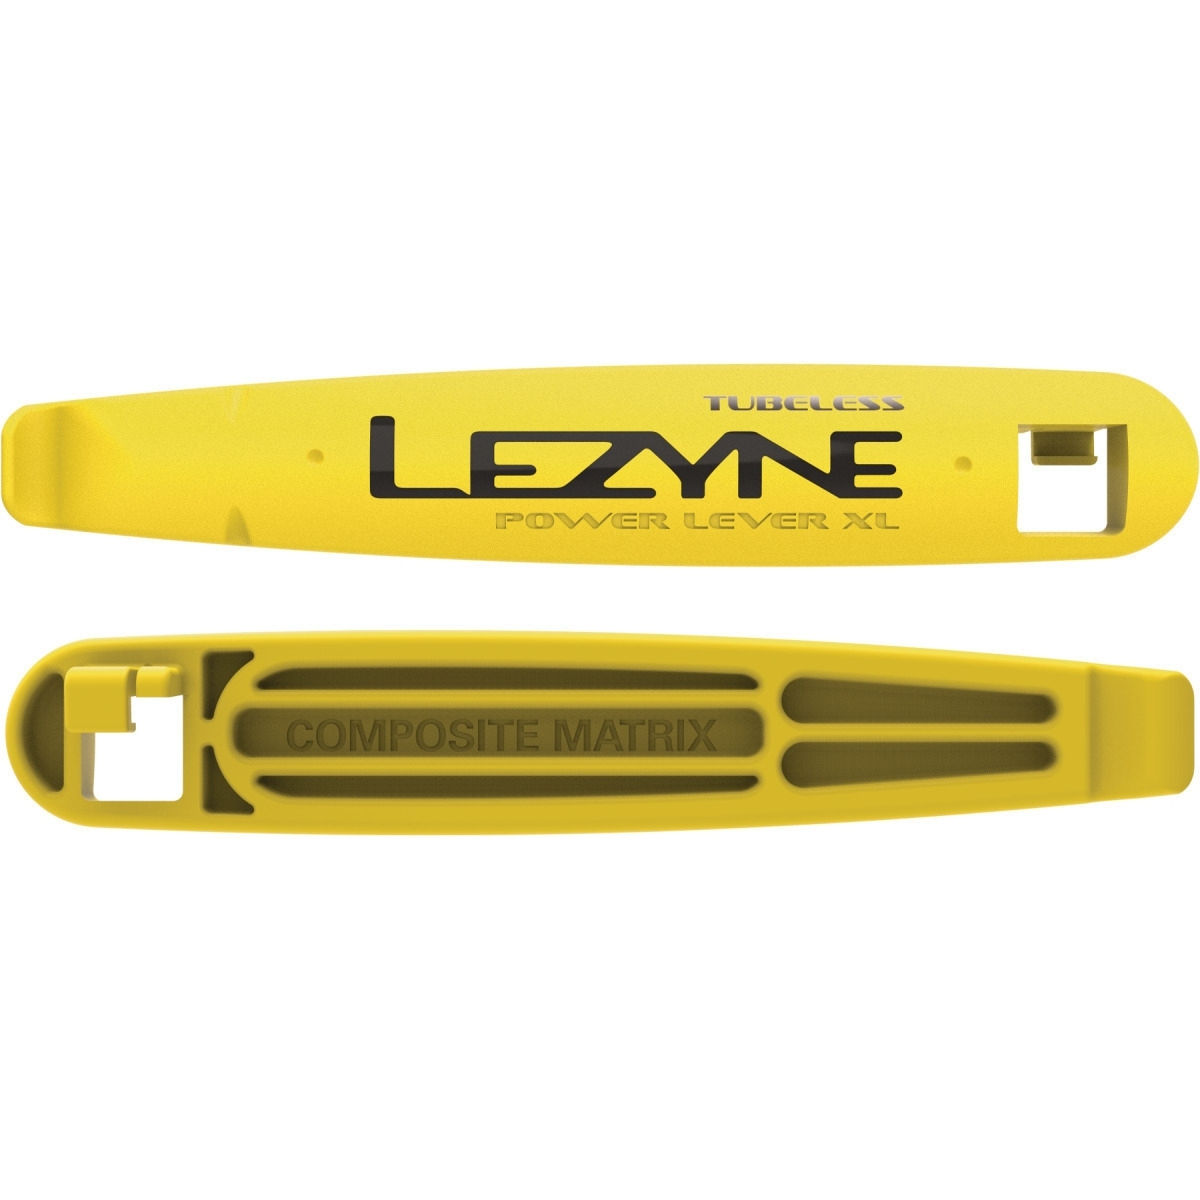 Lezyne Power Lever XL Tubeless - yellow